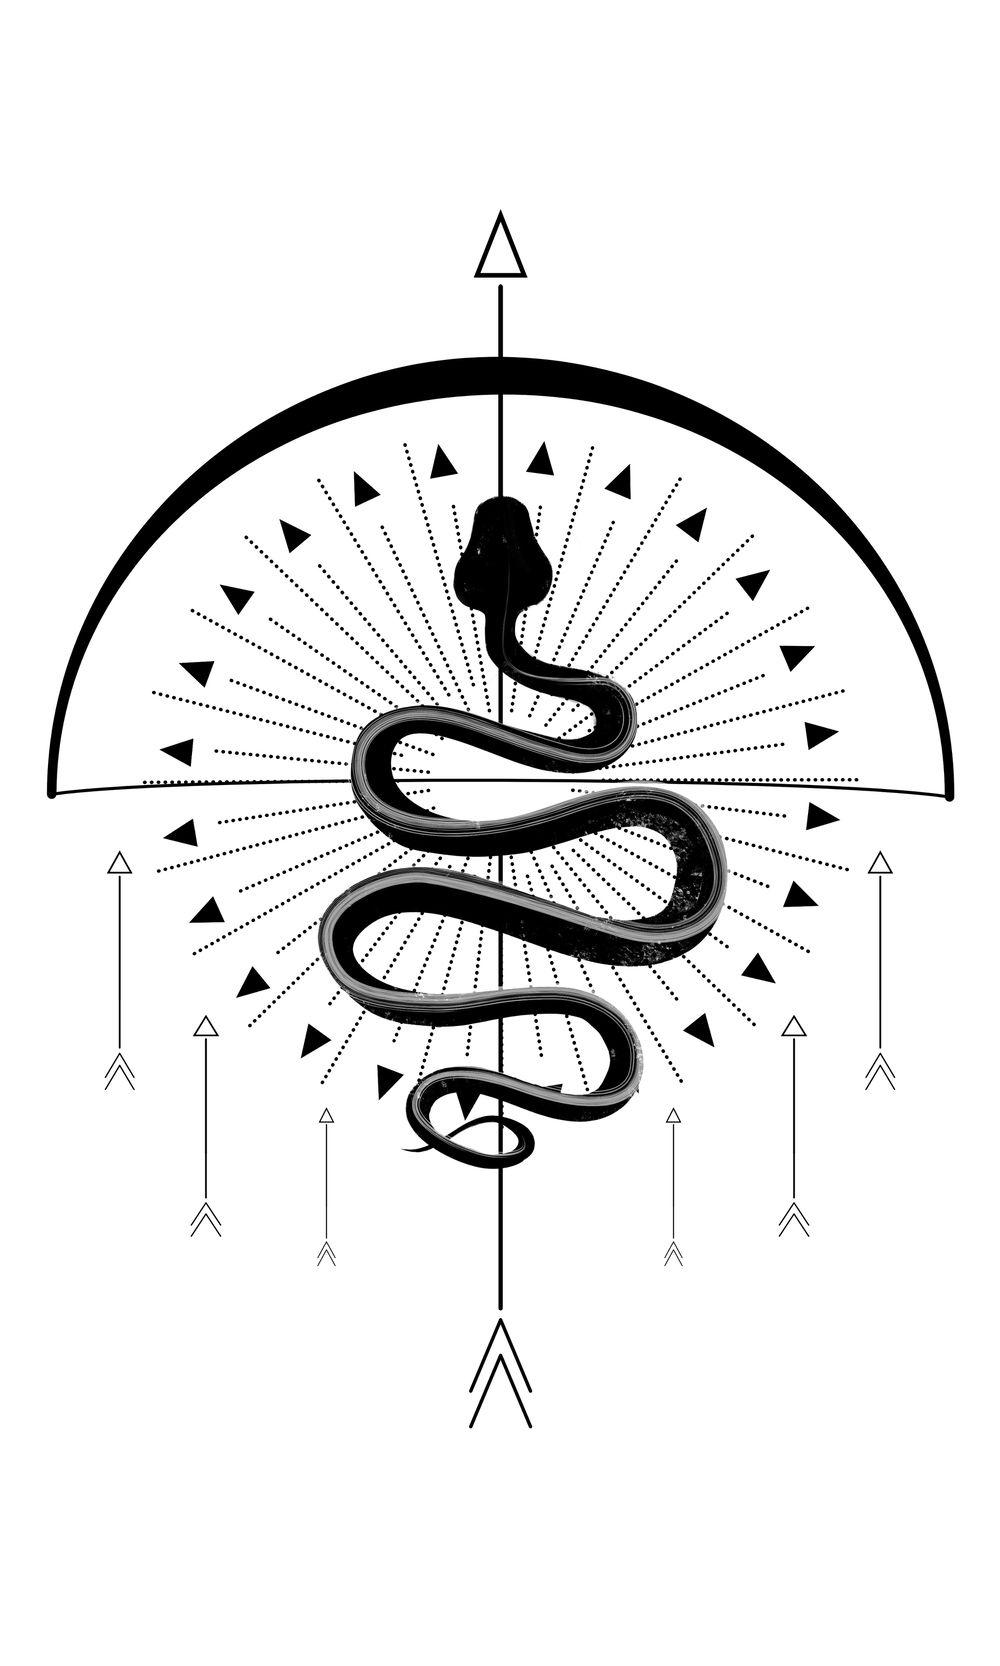 Sakey snake and dirty bastars - image 1 - student project